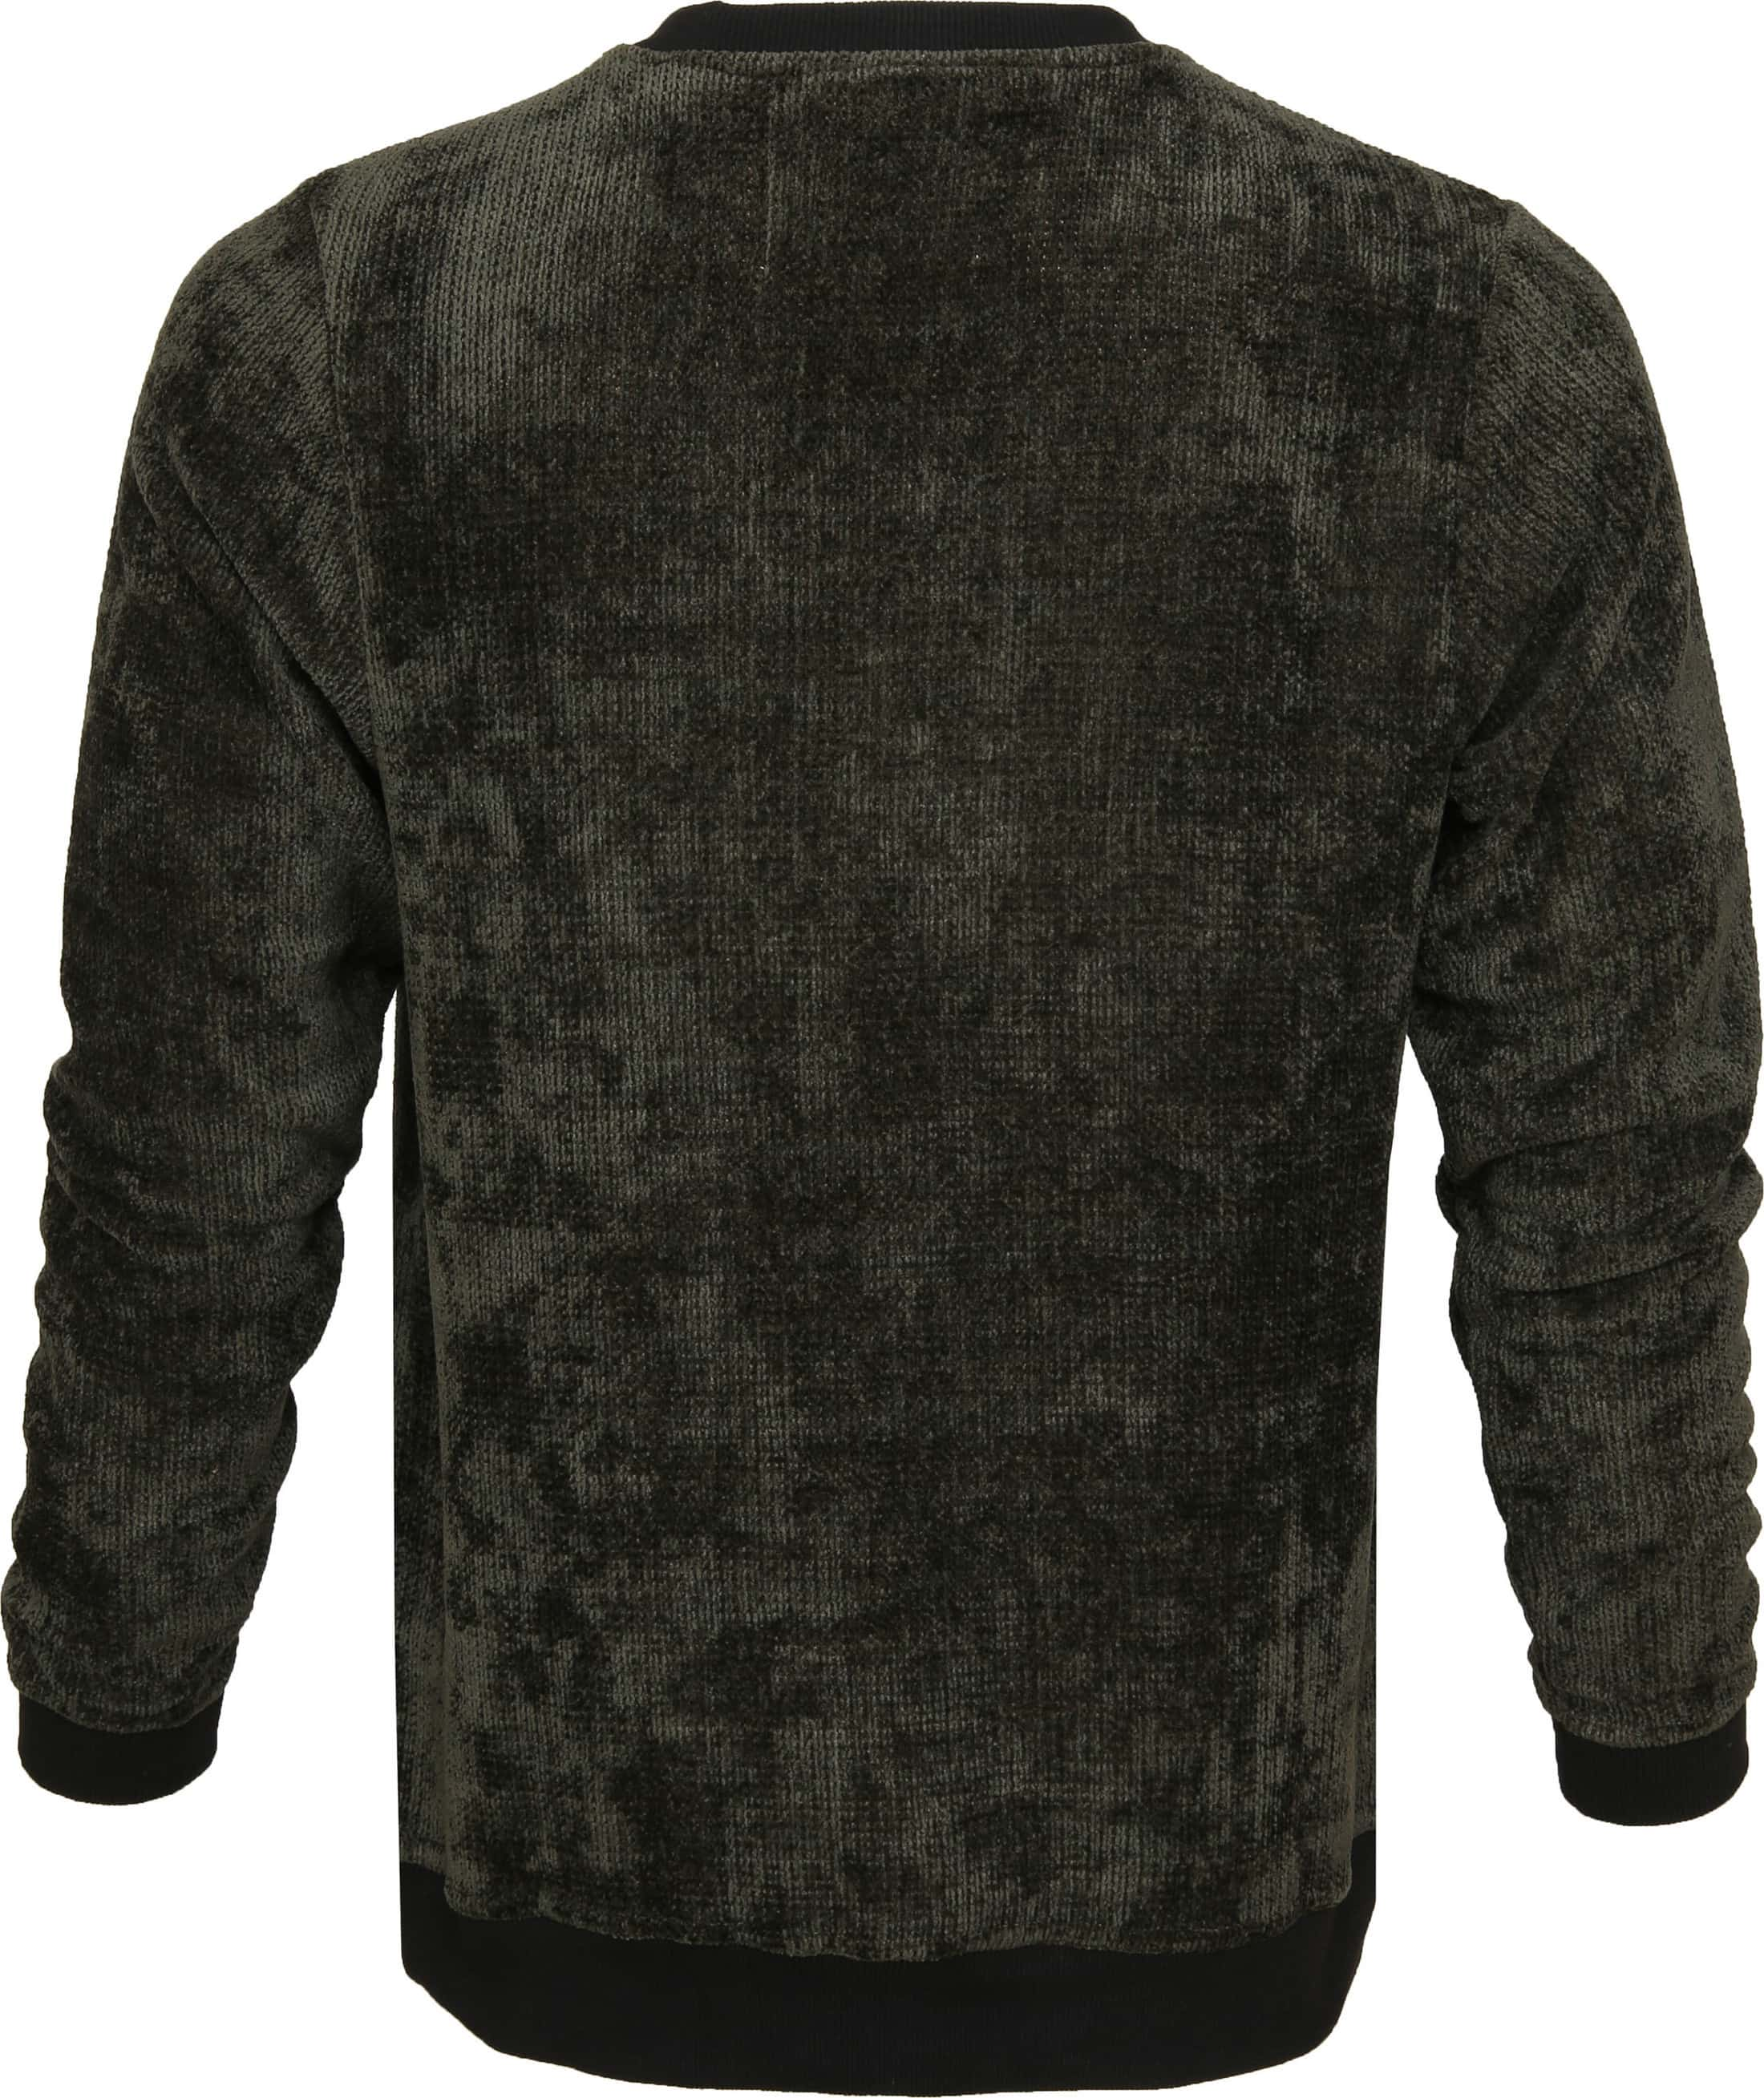 Anerkjendt Akalex Sweater Dunkelgrün foto 3